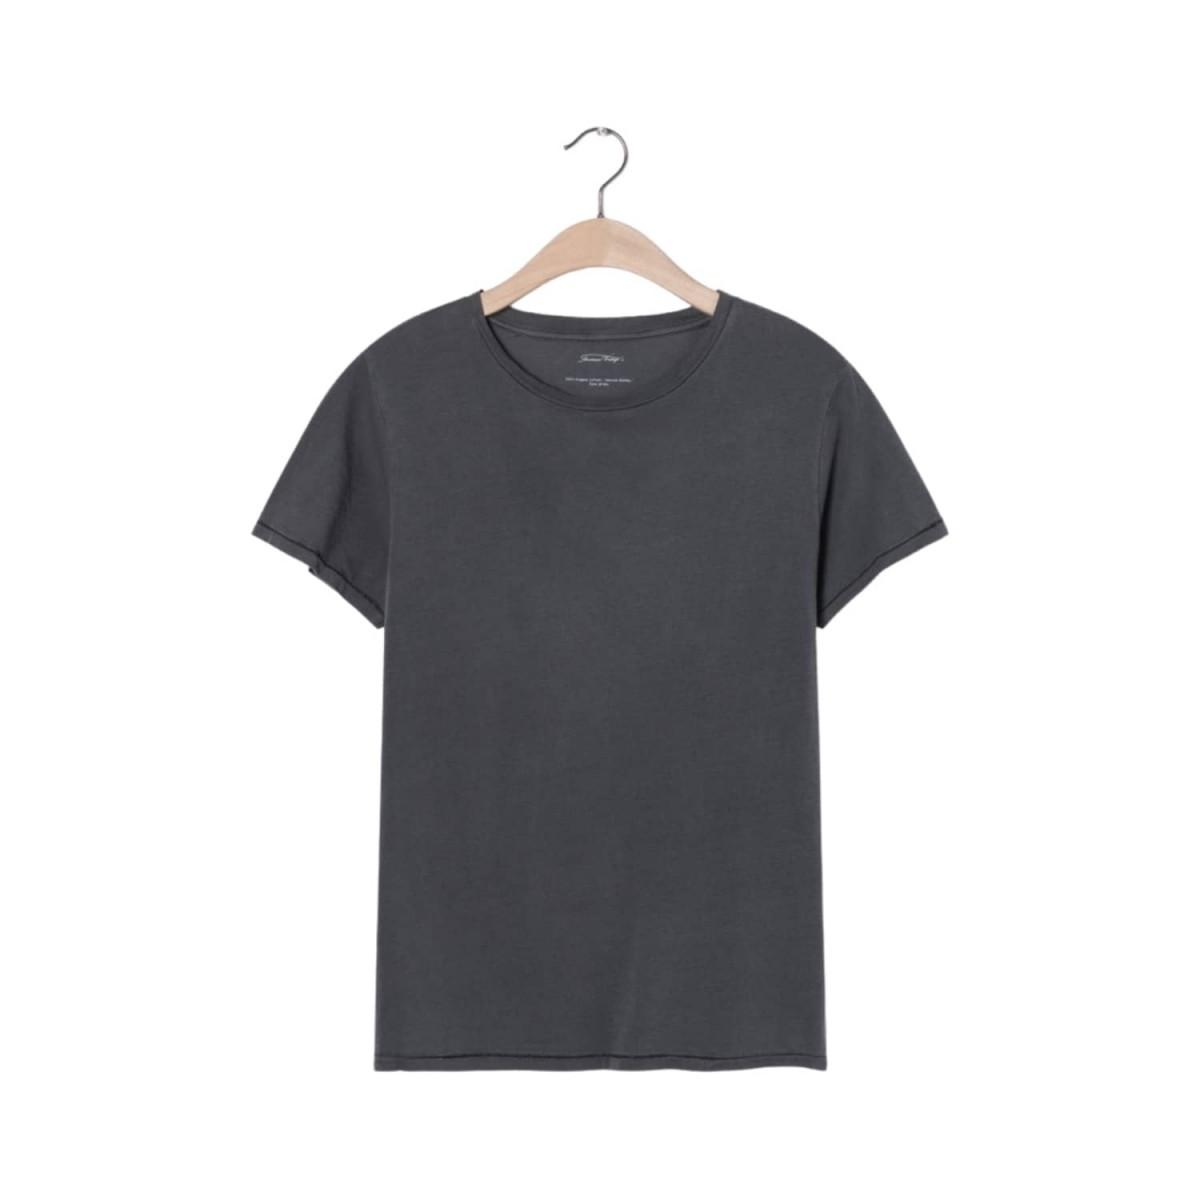 vegiflower t-shirt - metal - front billede